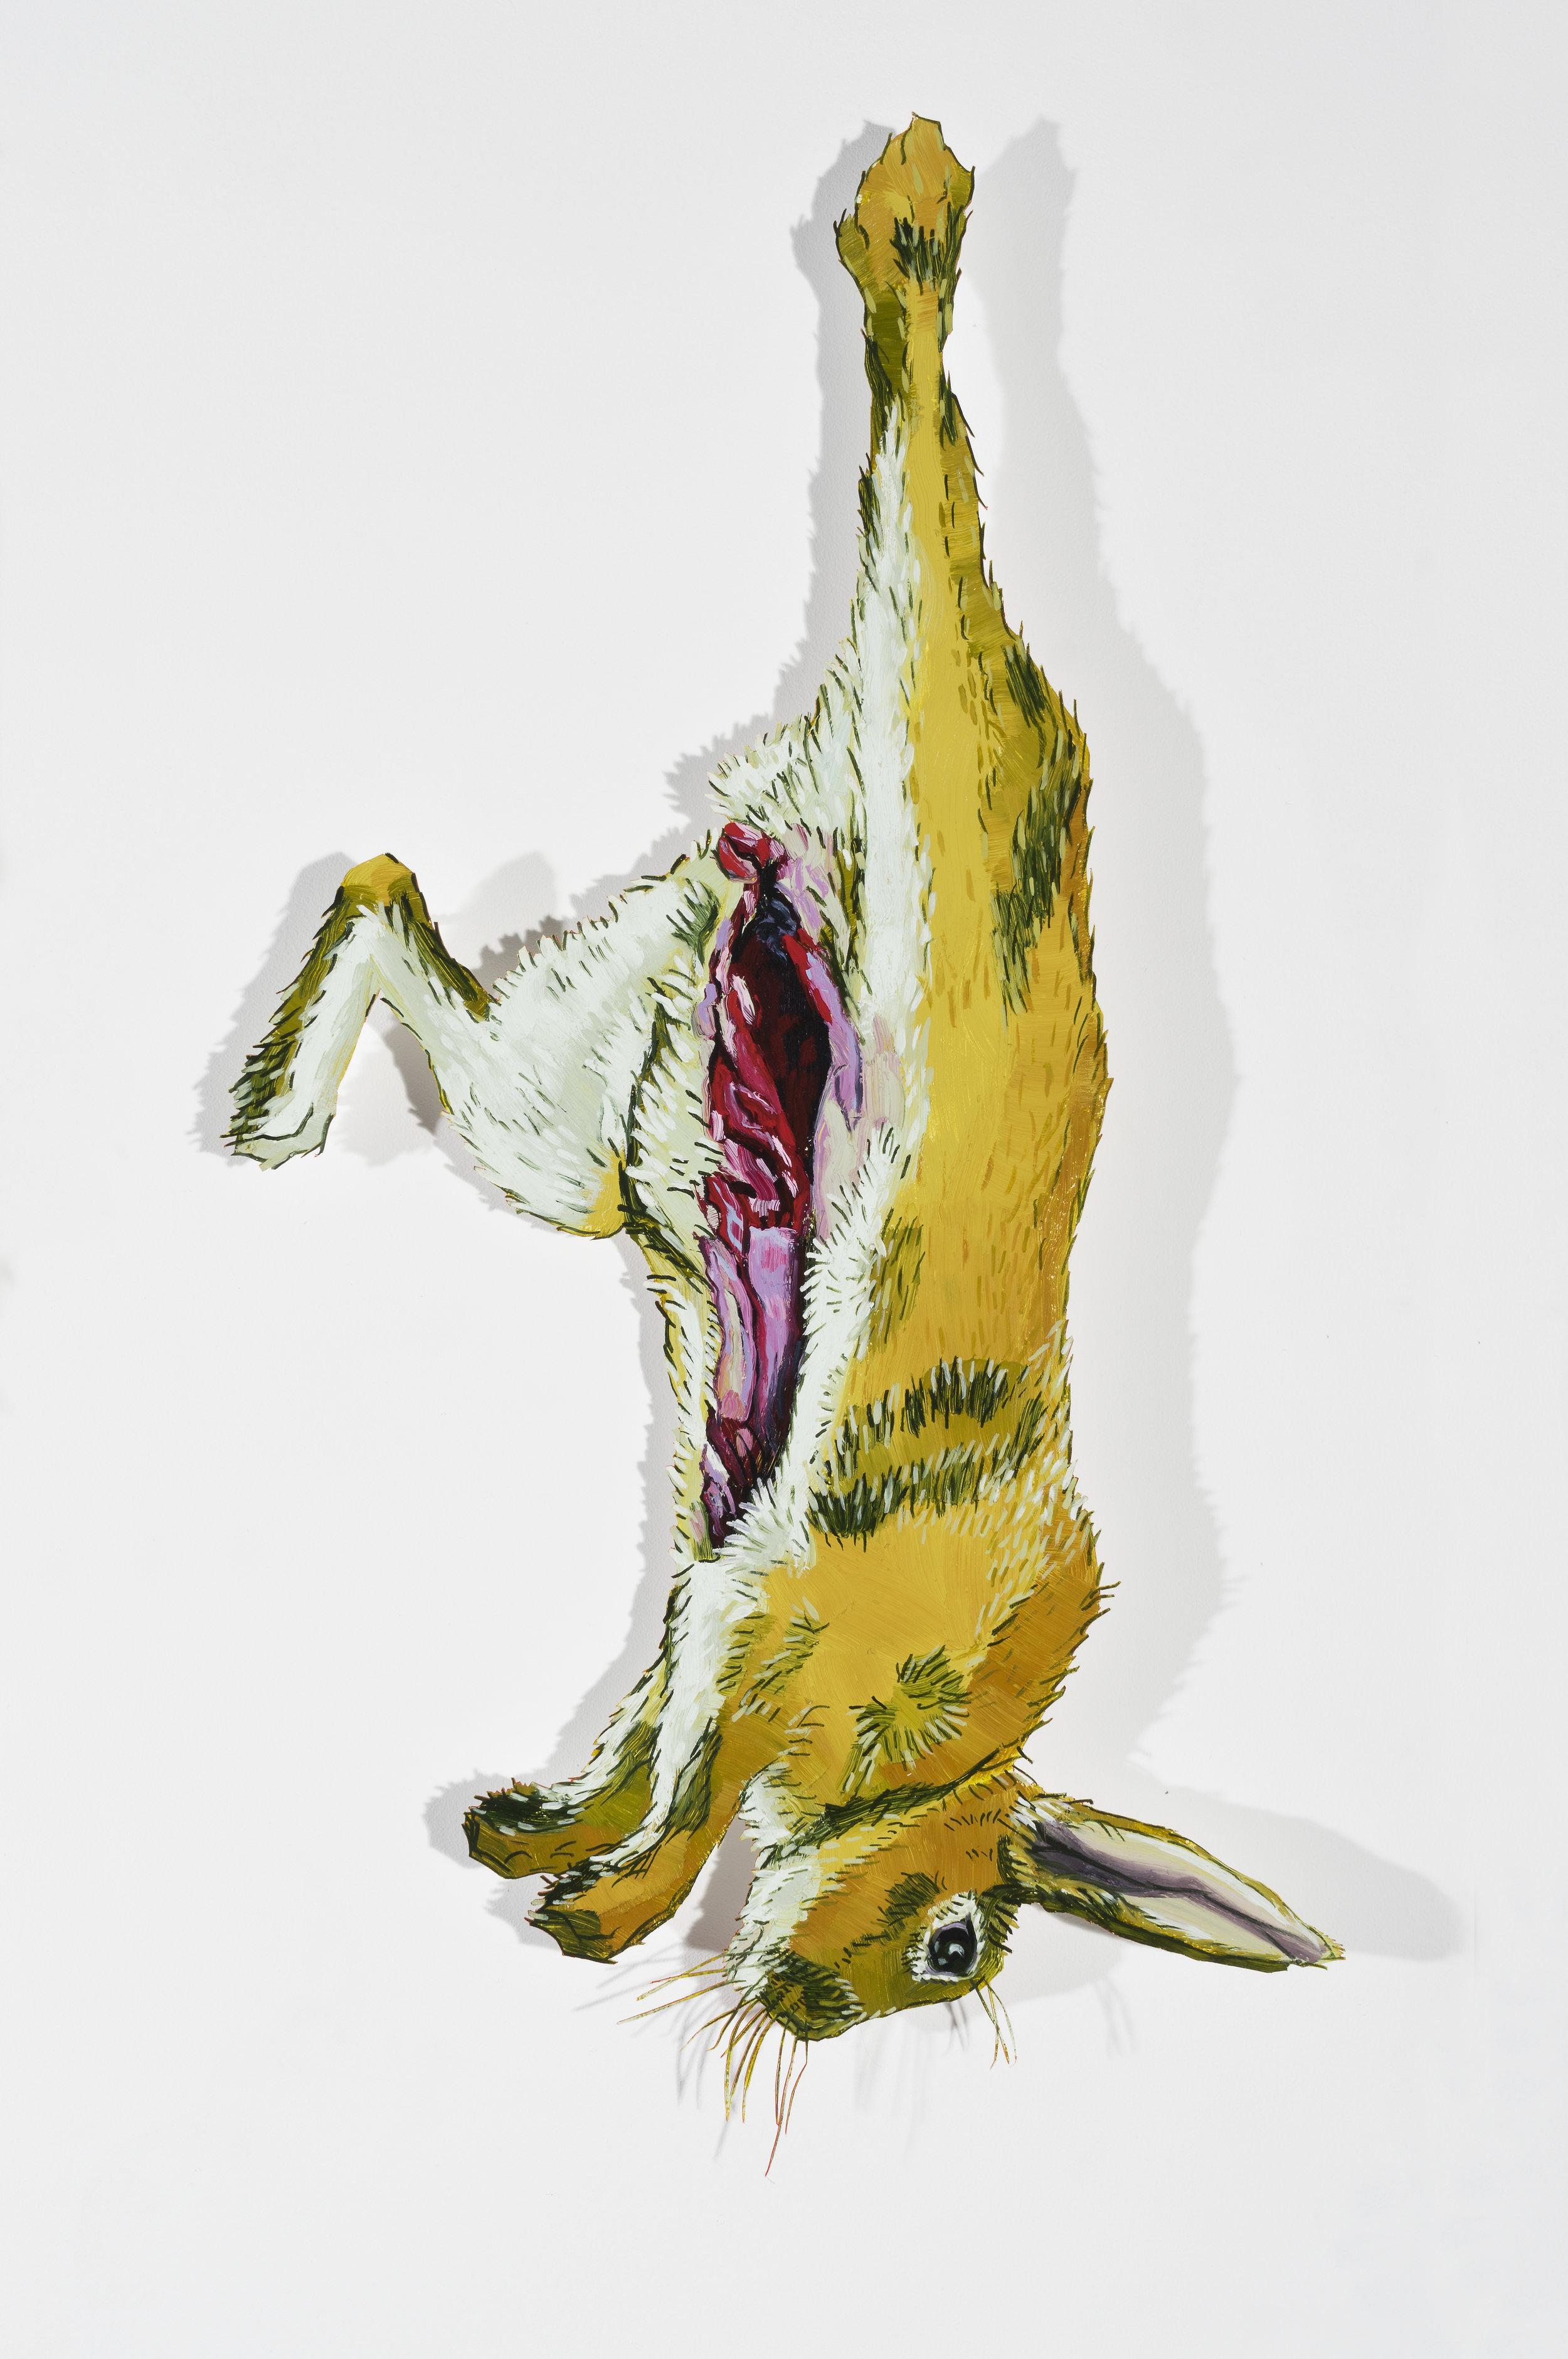 Dara Engler,Paper Doll Meat Locker, 2016 Oil on paper (Rabbit detail)